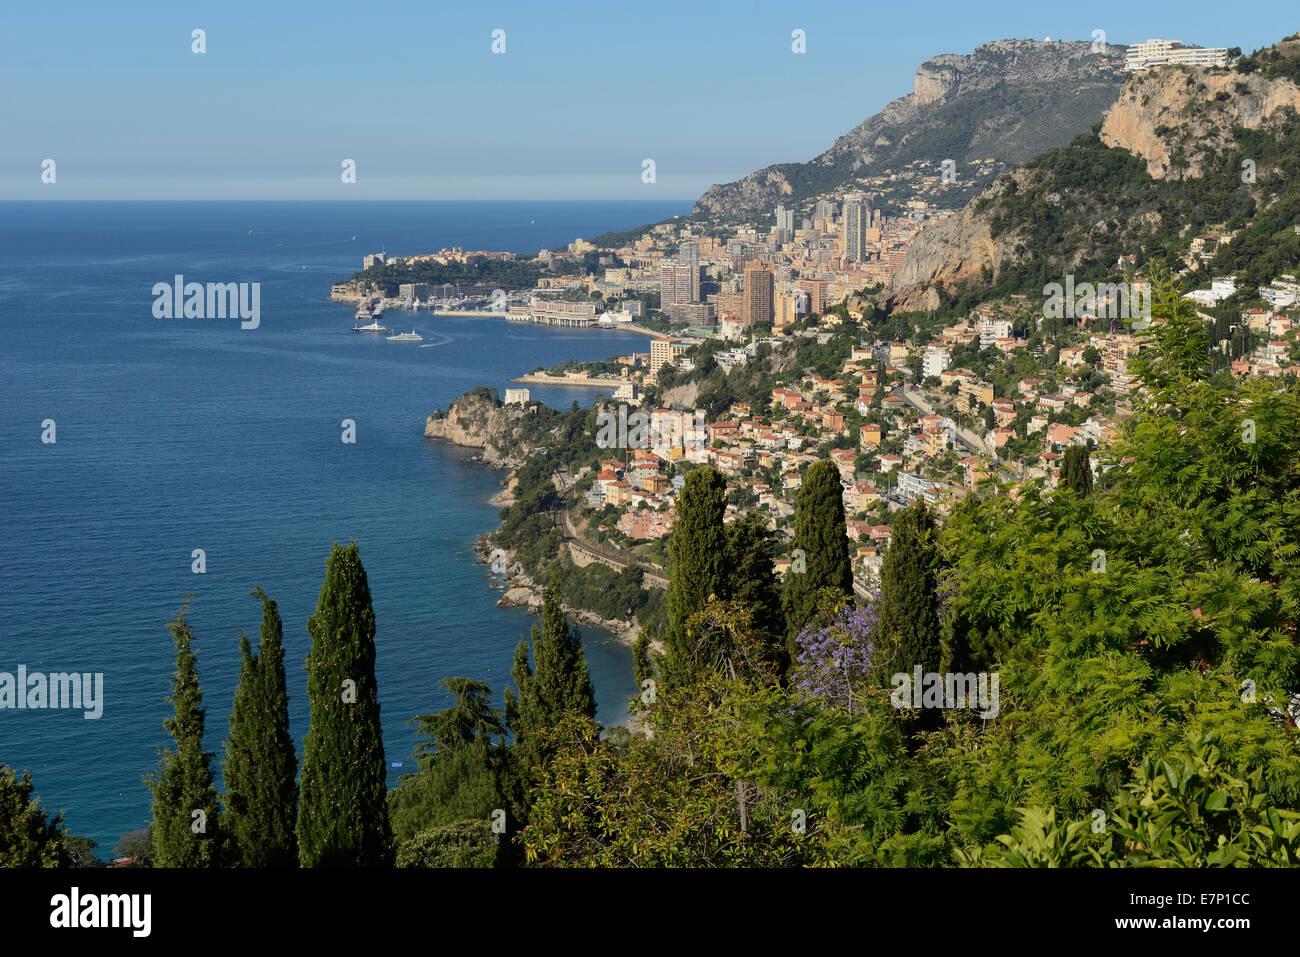 Europe, France, Cote d'Azur, Monaco, Monte Carlo, Riviera, Mediterranean, coastal, coast, city - Stock Image